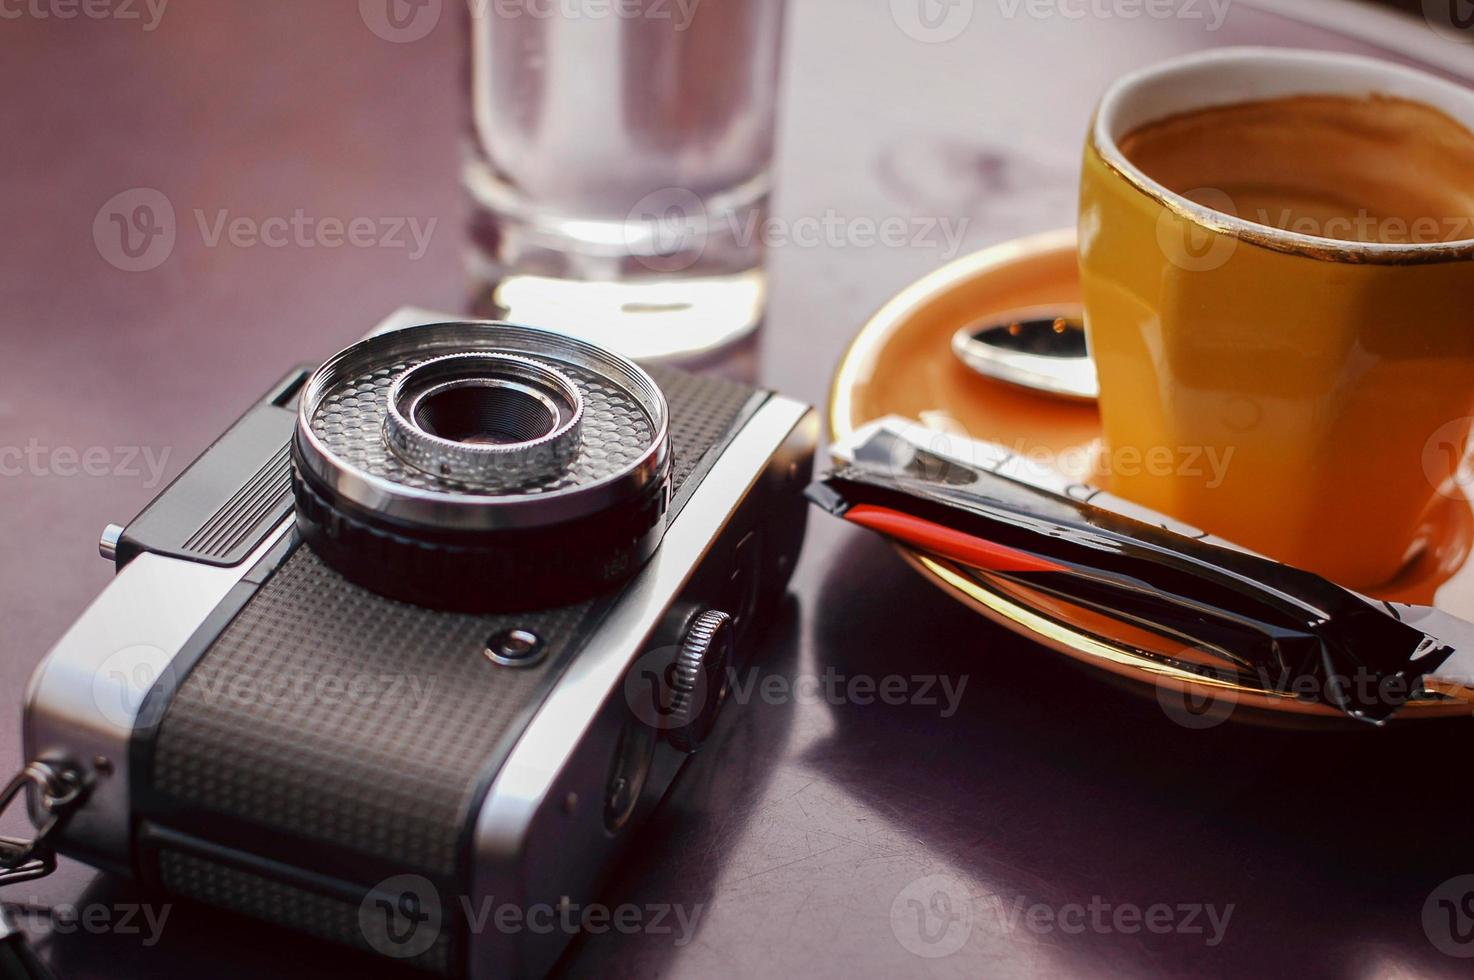 lege kop koffie en retro camera foto